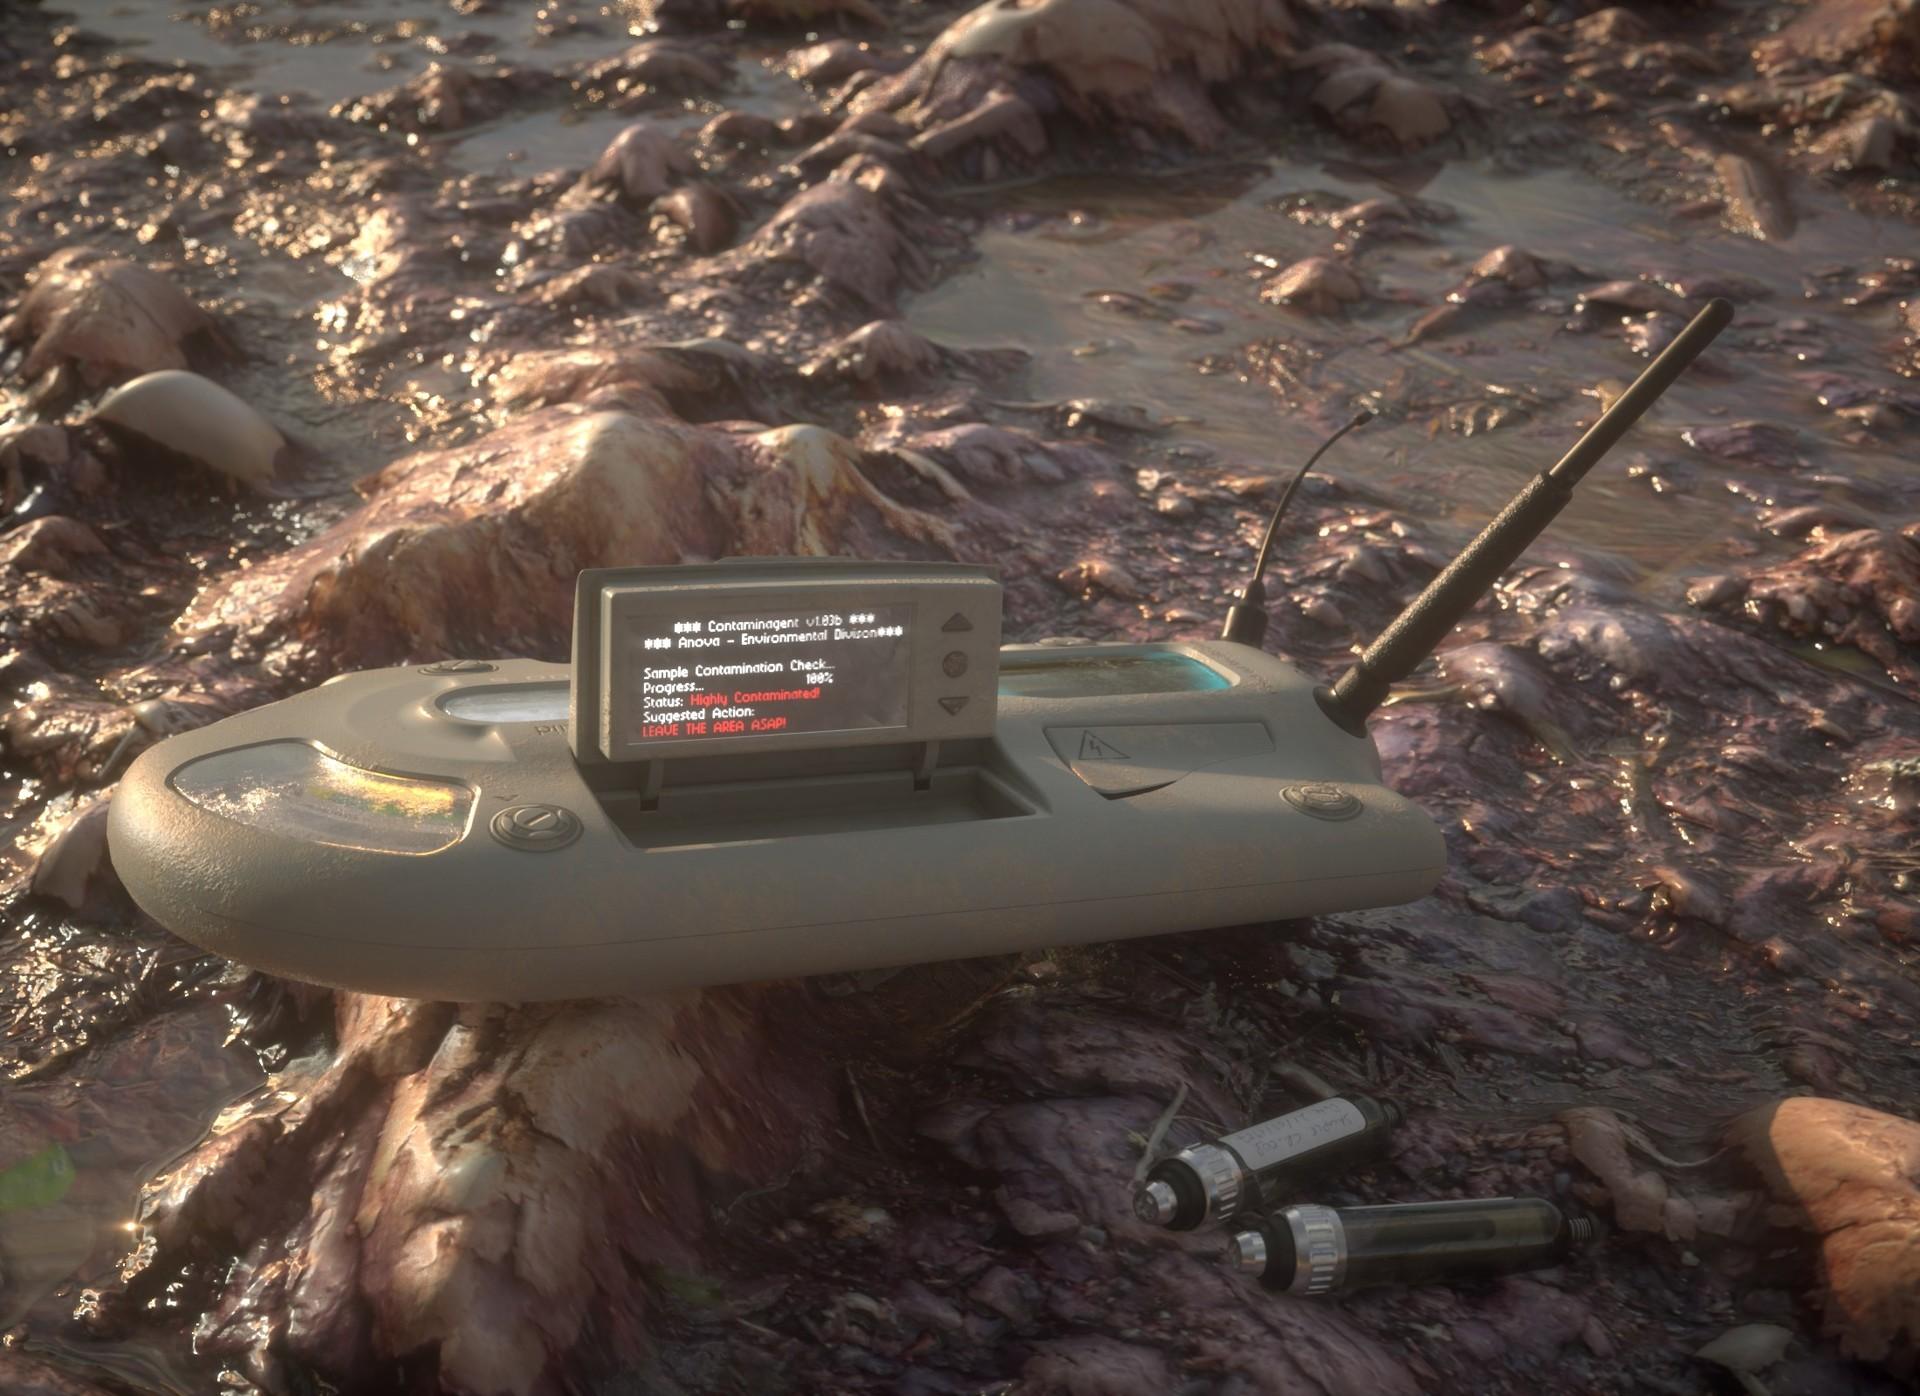 Cem tezcan device scene 00004